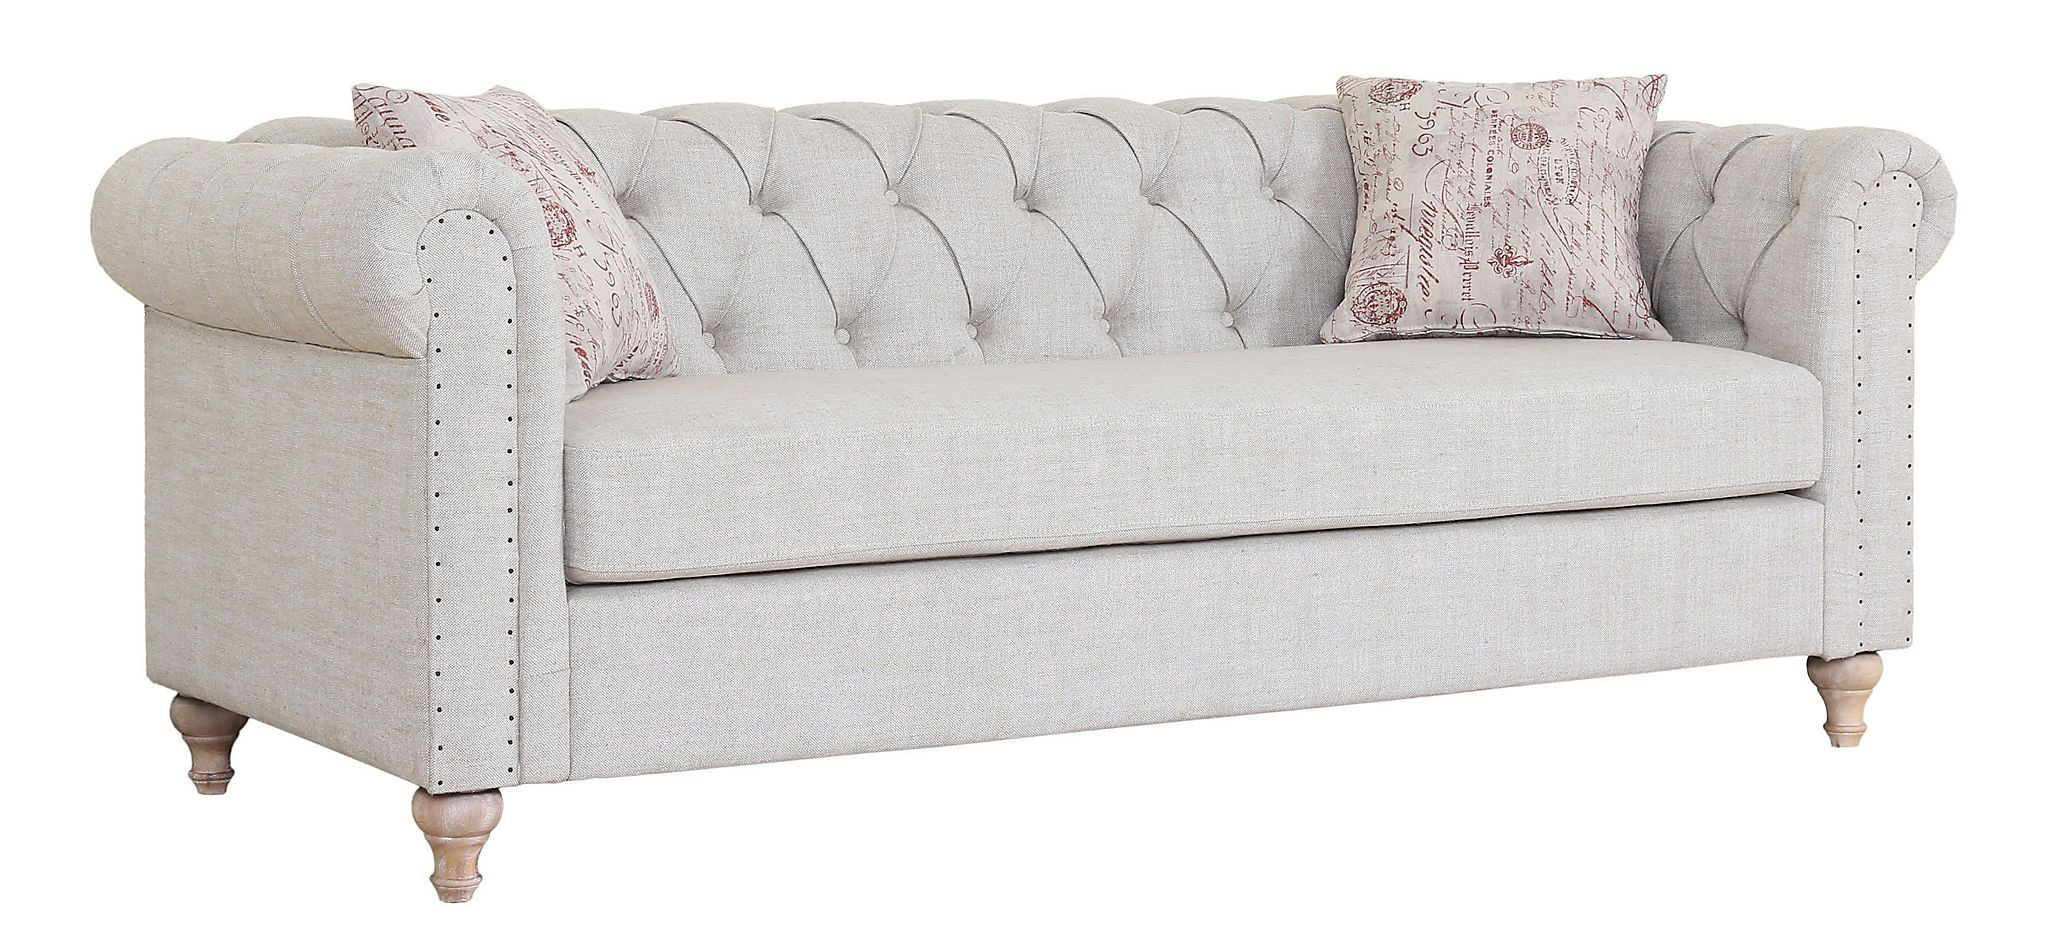 Trending Tufted Linen Sofa | Kirklands